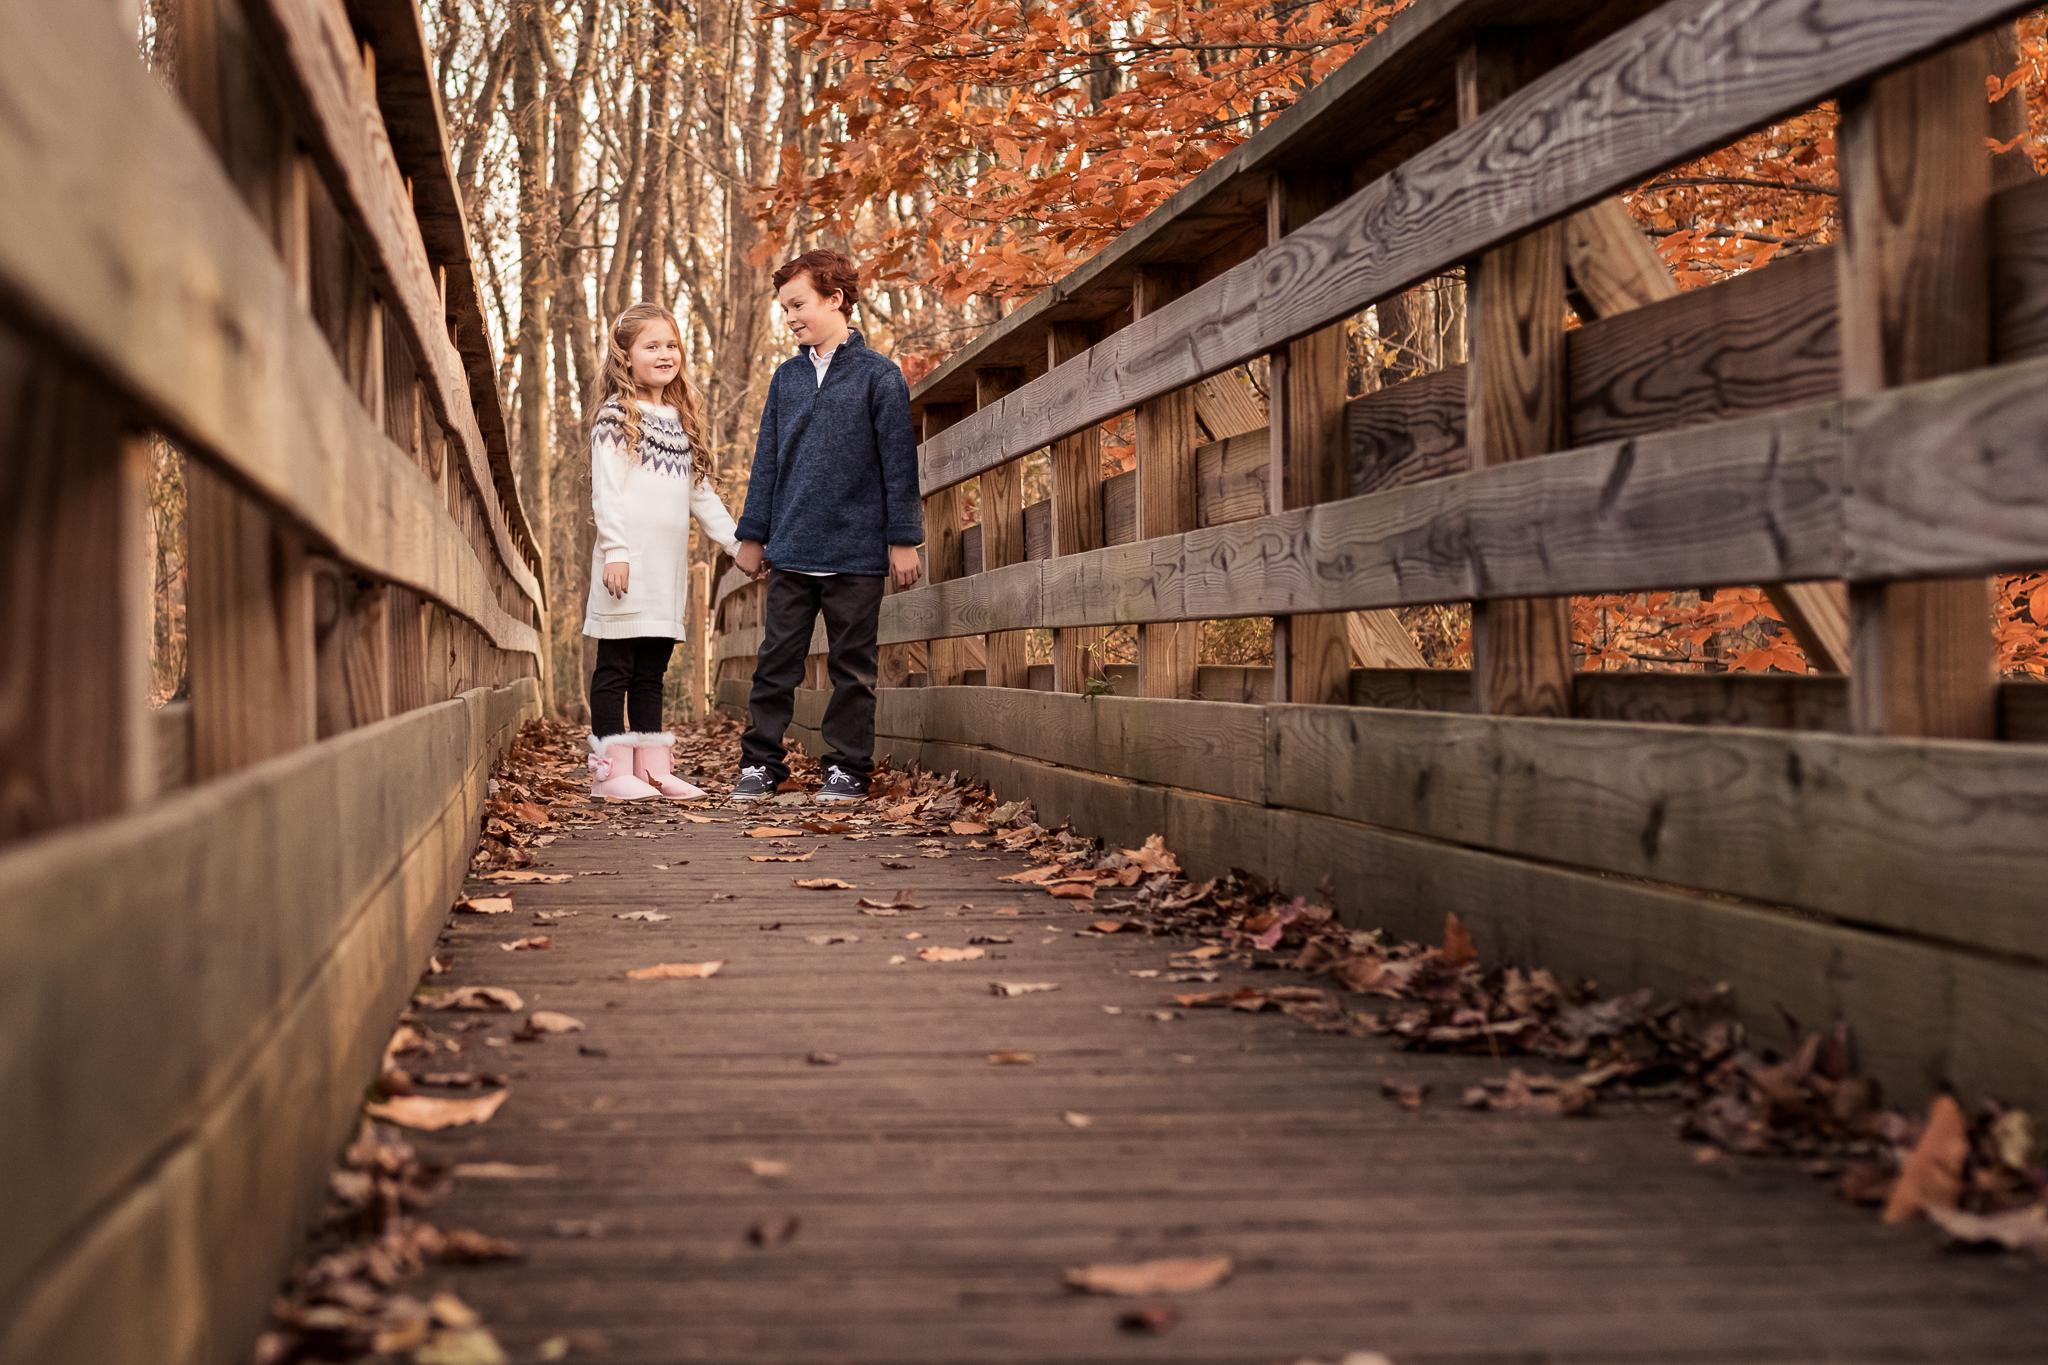 NancyElizabethPhotography, South Jersey Photographer, Siblings on Bridge